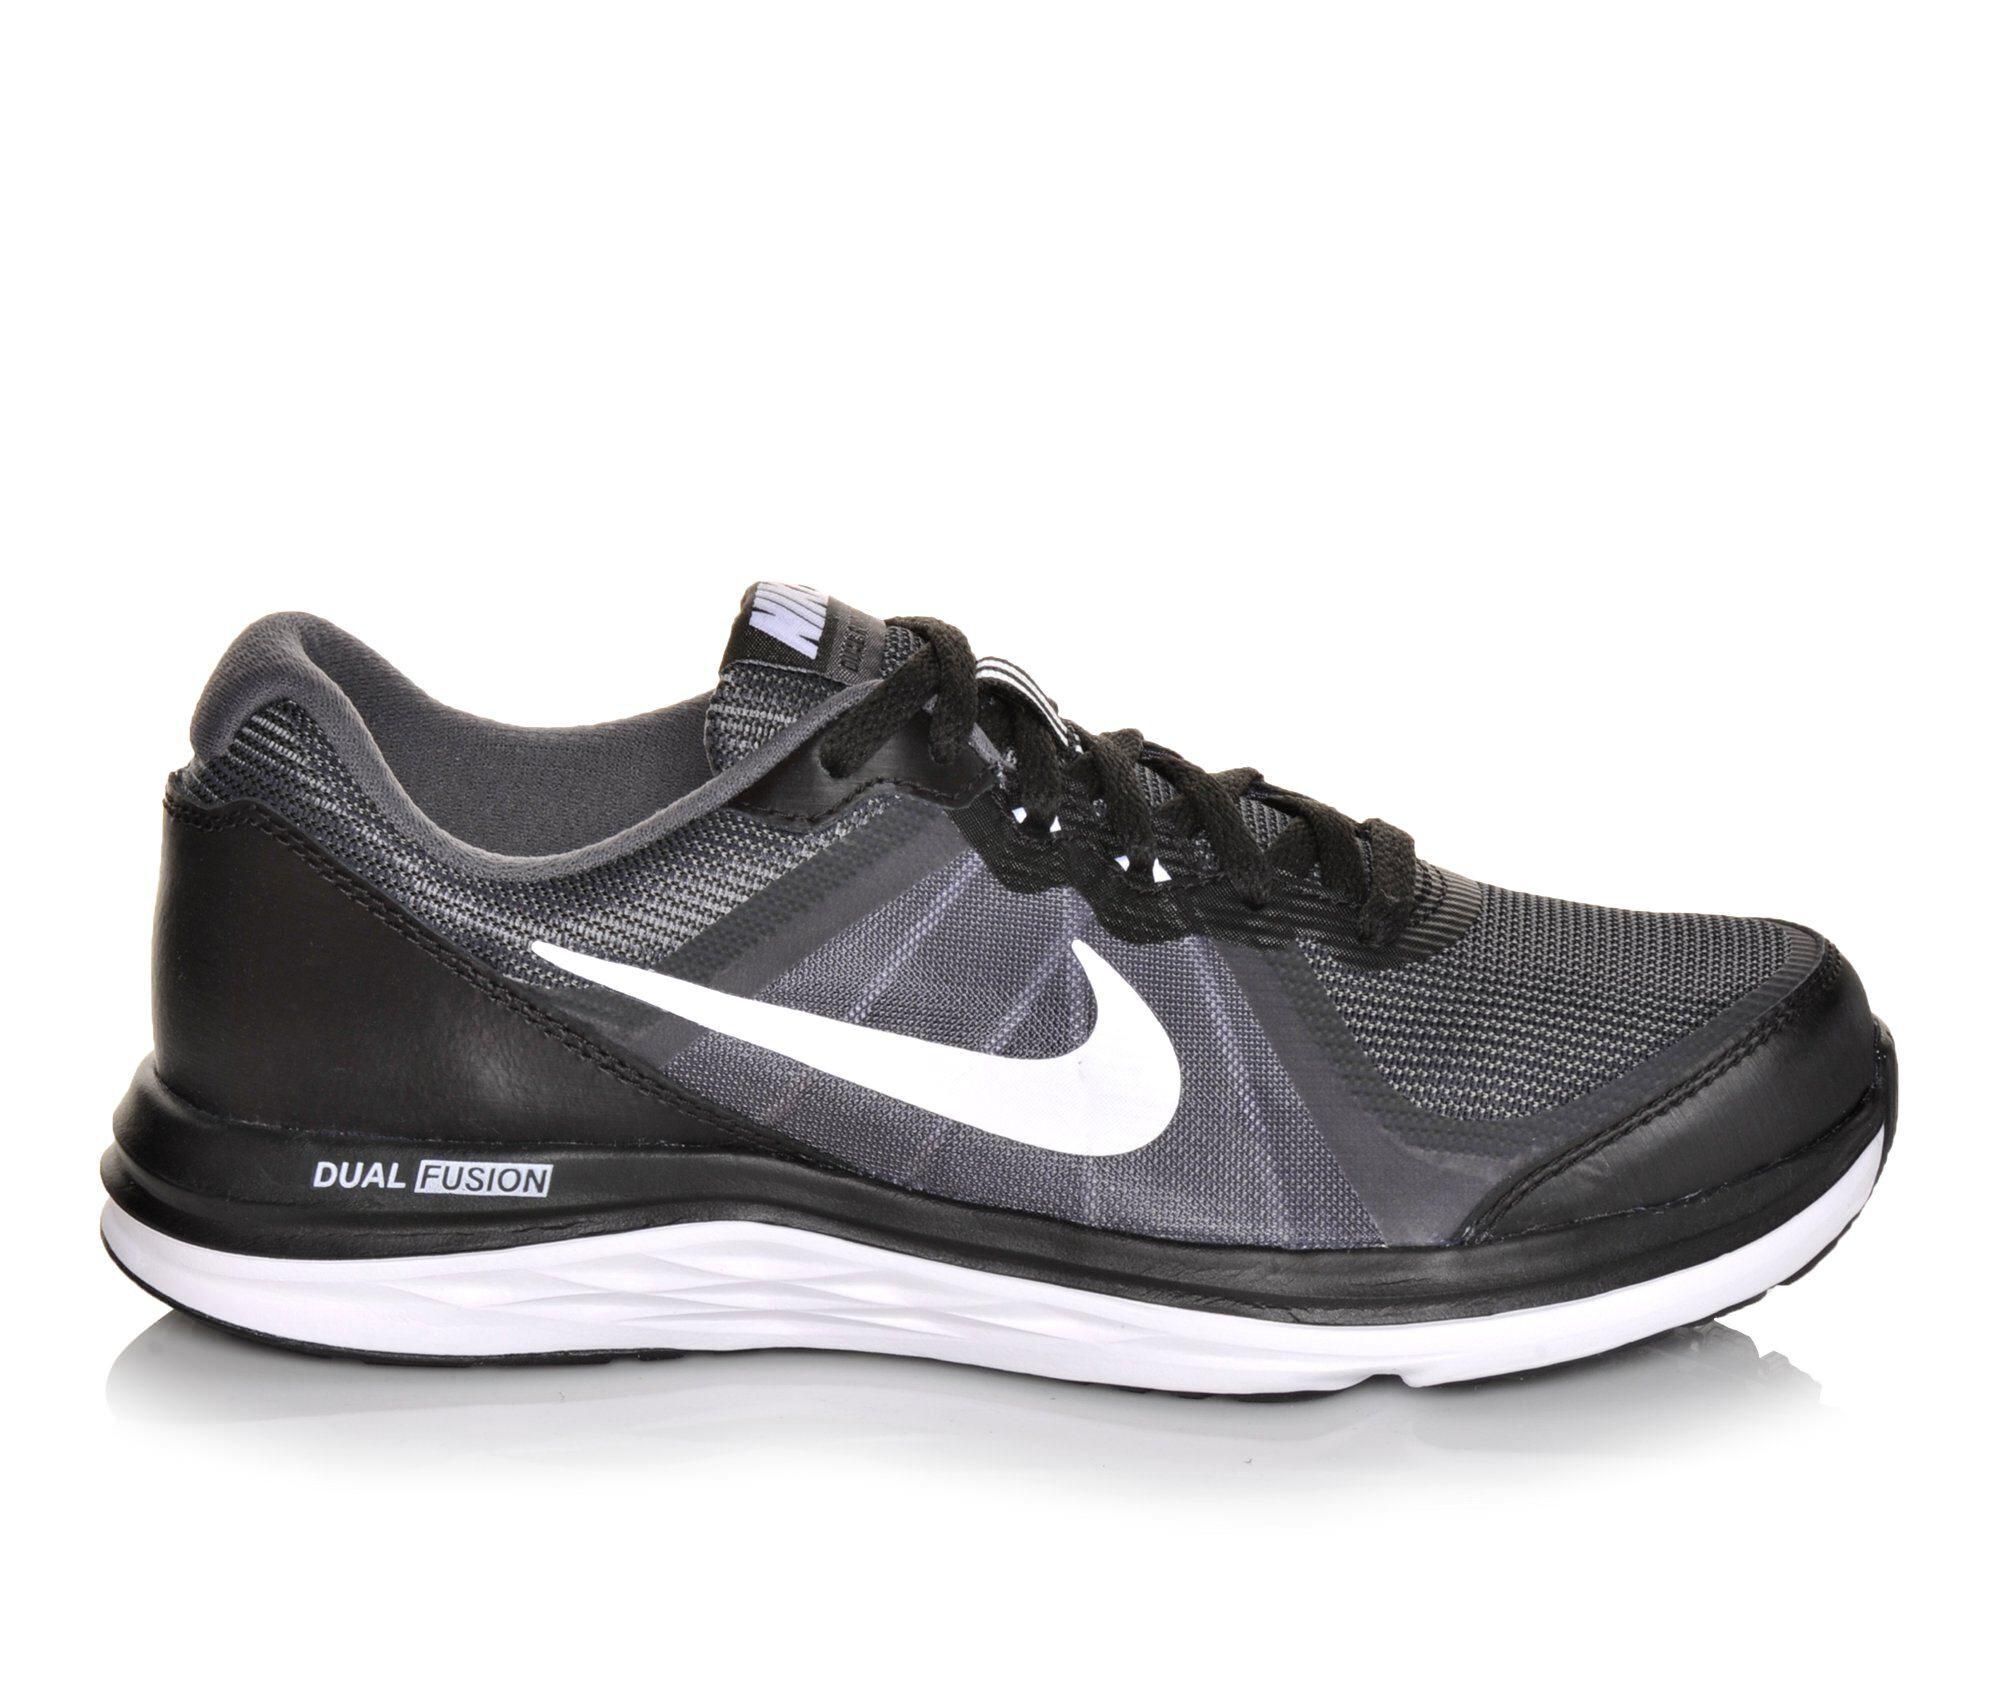 Boys Nike Dual Fusion X2 357 Running Shoes